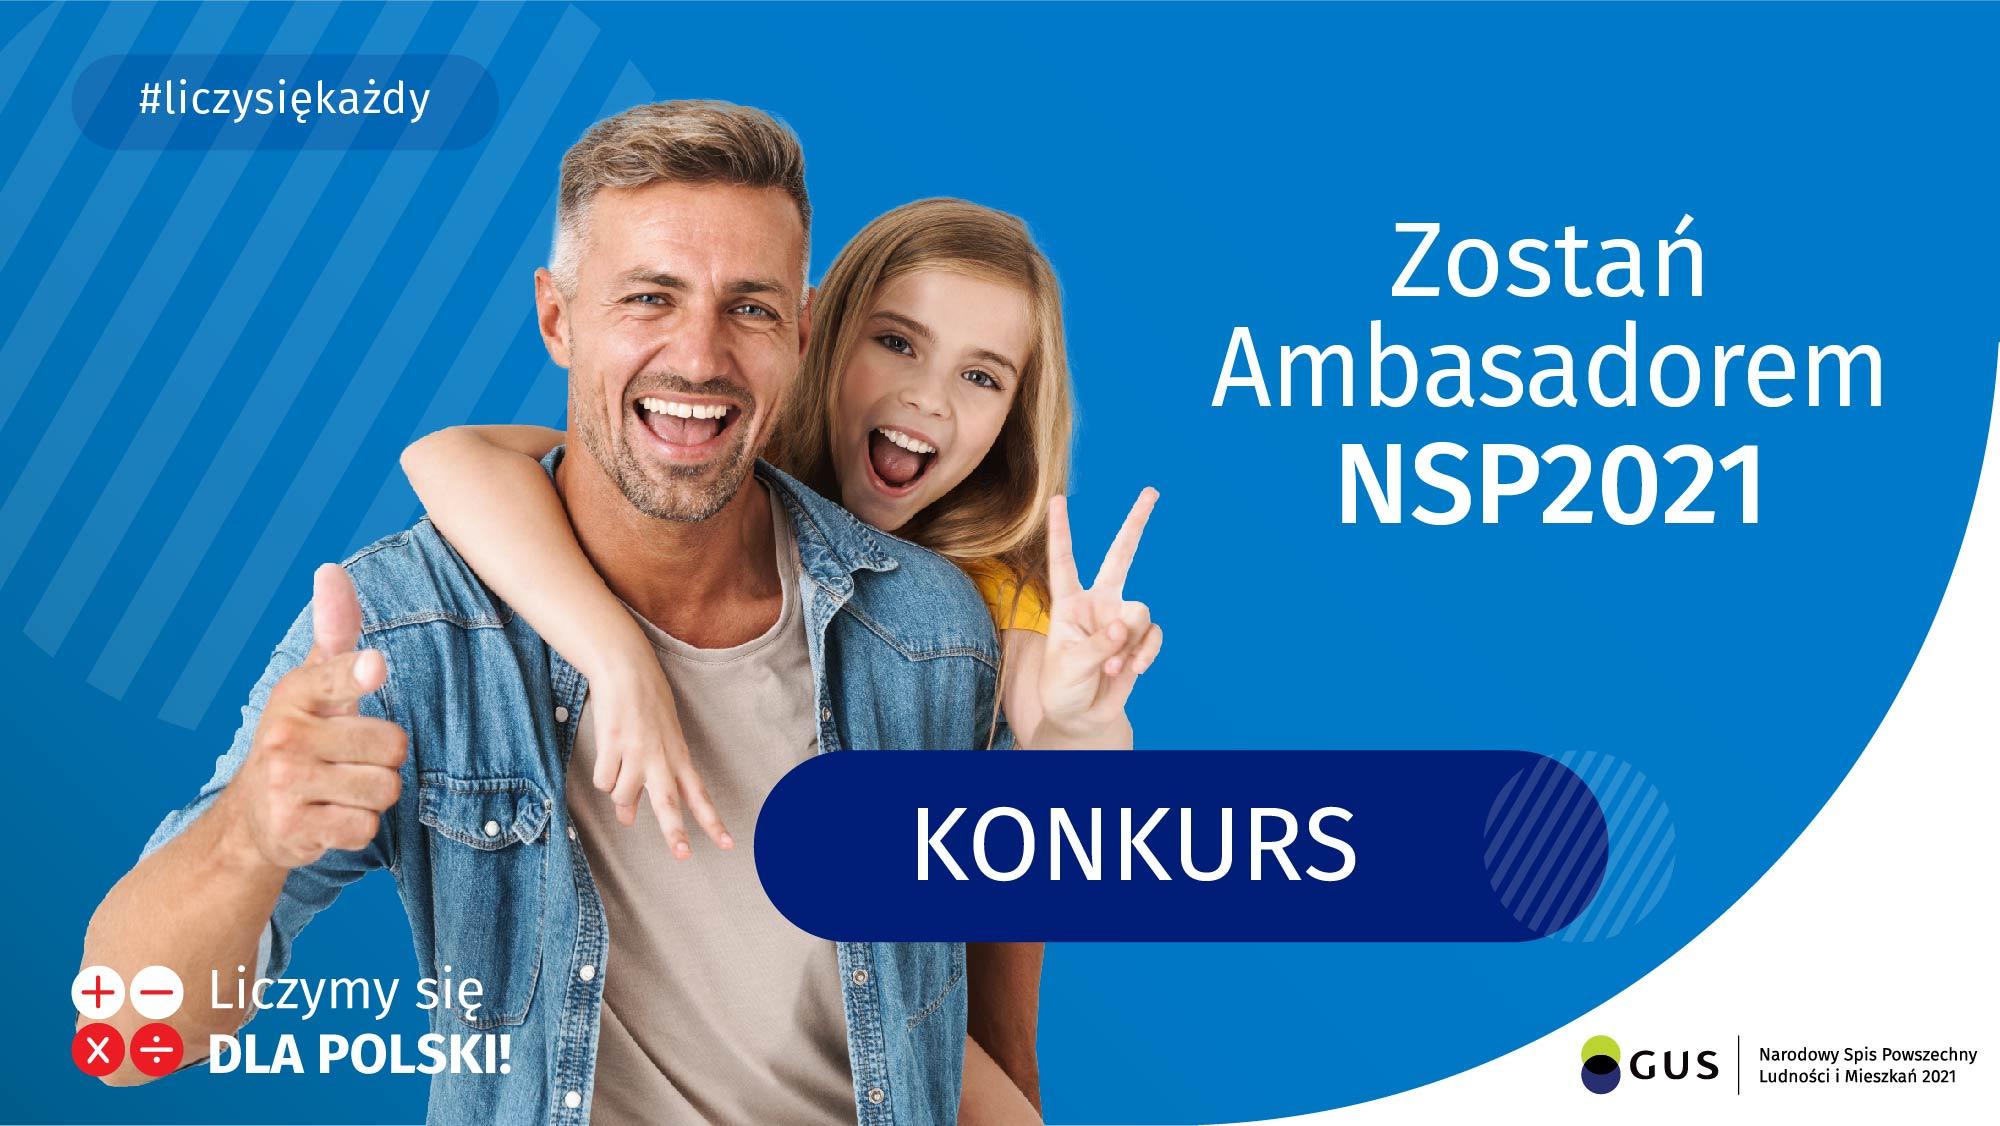 Studencie PŚk zostań Ambasadorem NSP2021